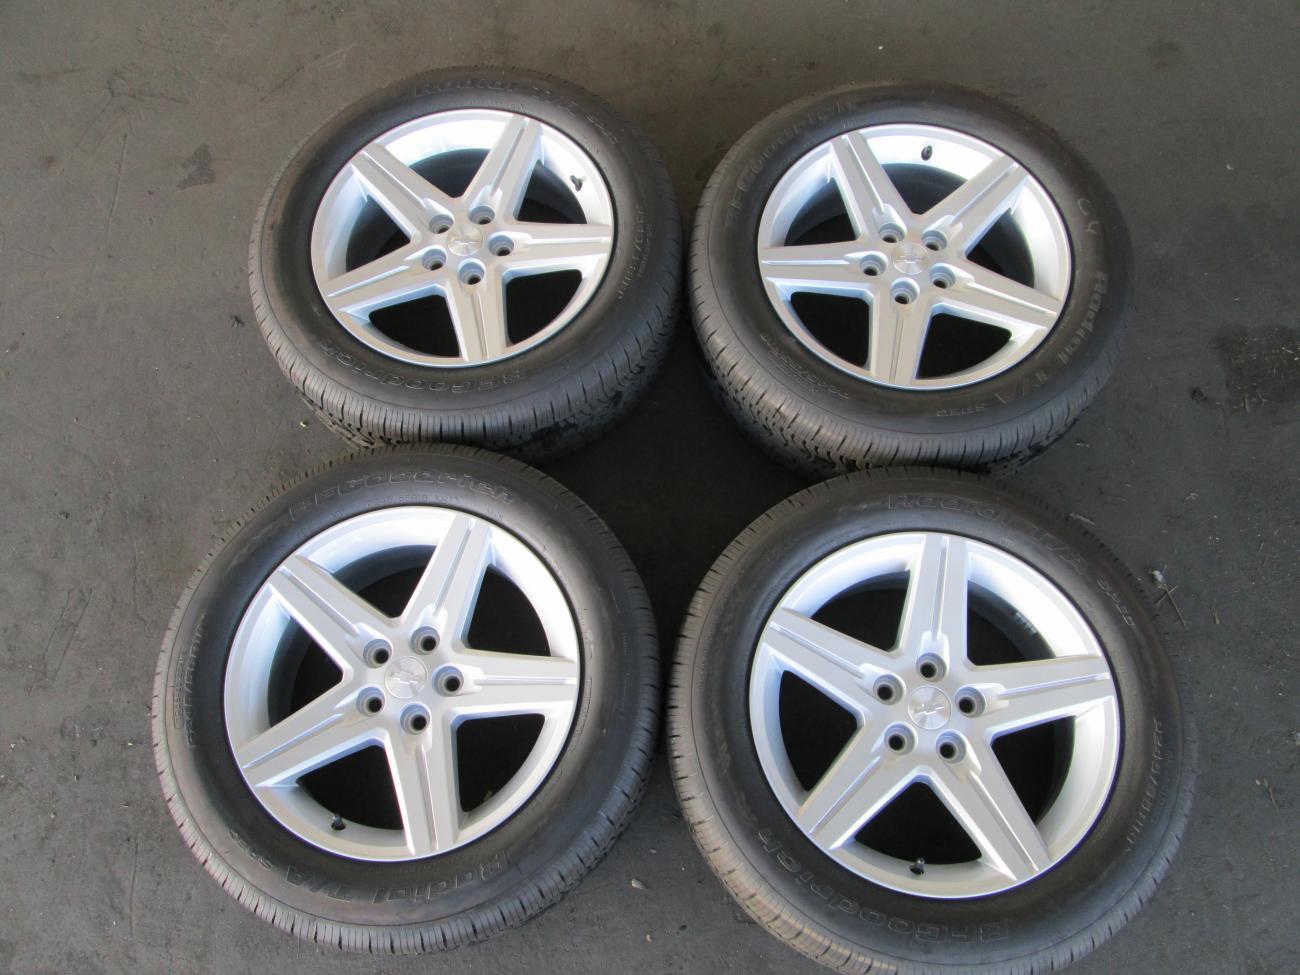 chevy camaro 18 wheels rims stock oem factory alloy 4 bf goodrich tires camaro5 chevy. Black Bedroom Furniture Sets. Home Design Ideas